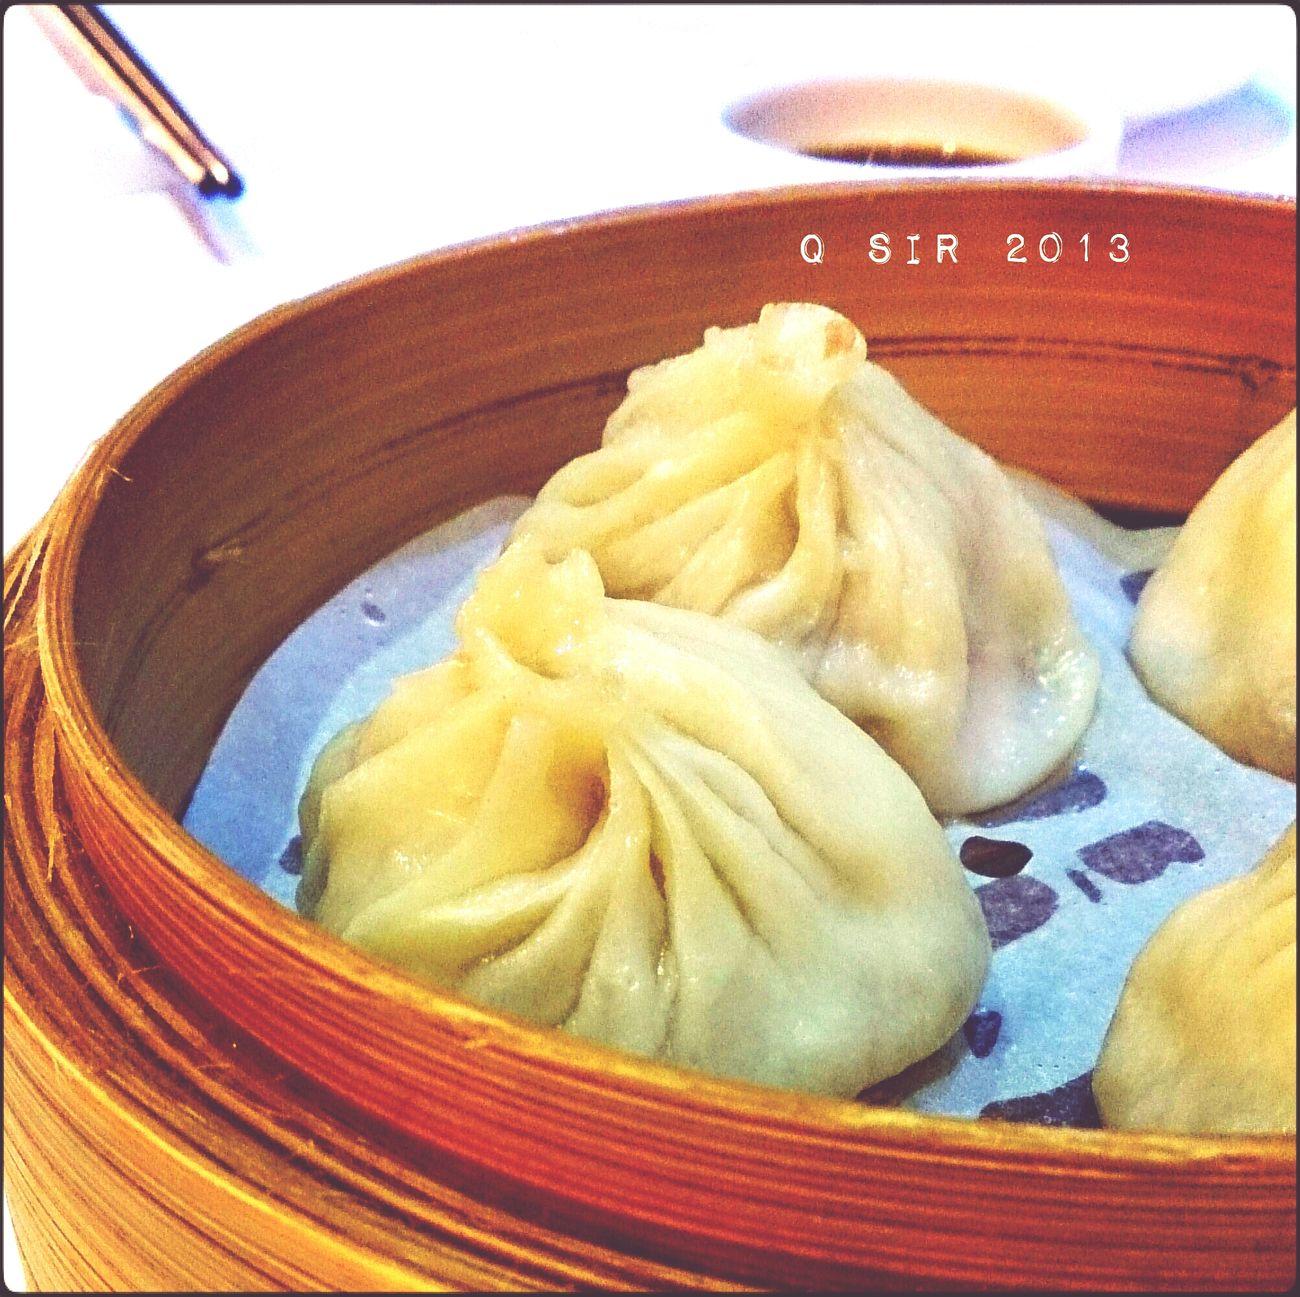 Dinner Chinese Food Steamed Dumplings HongKong